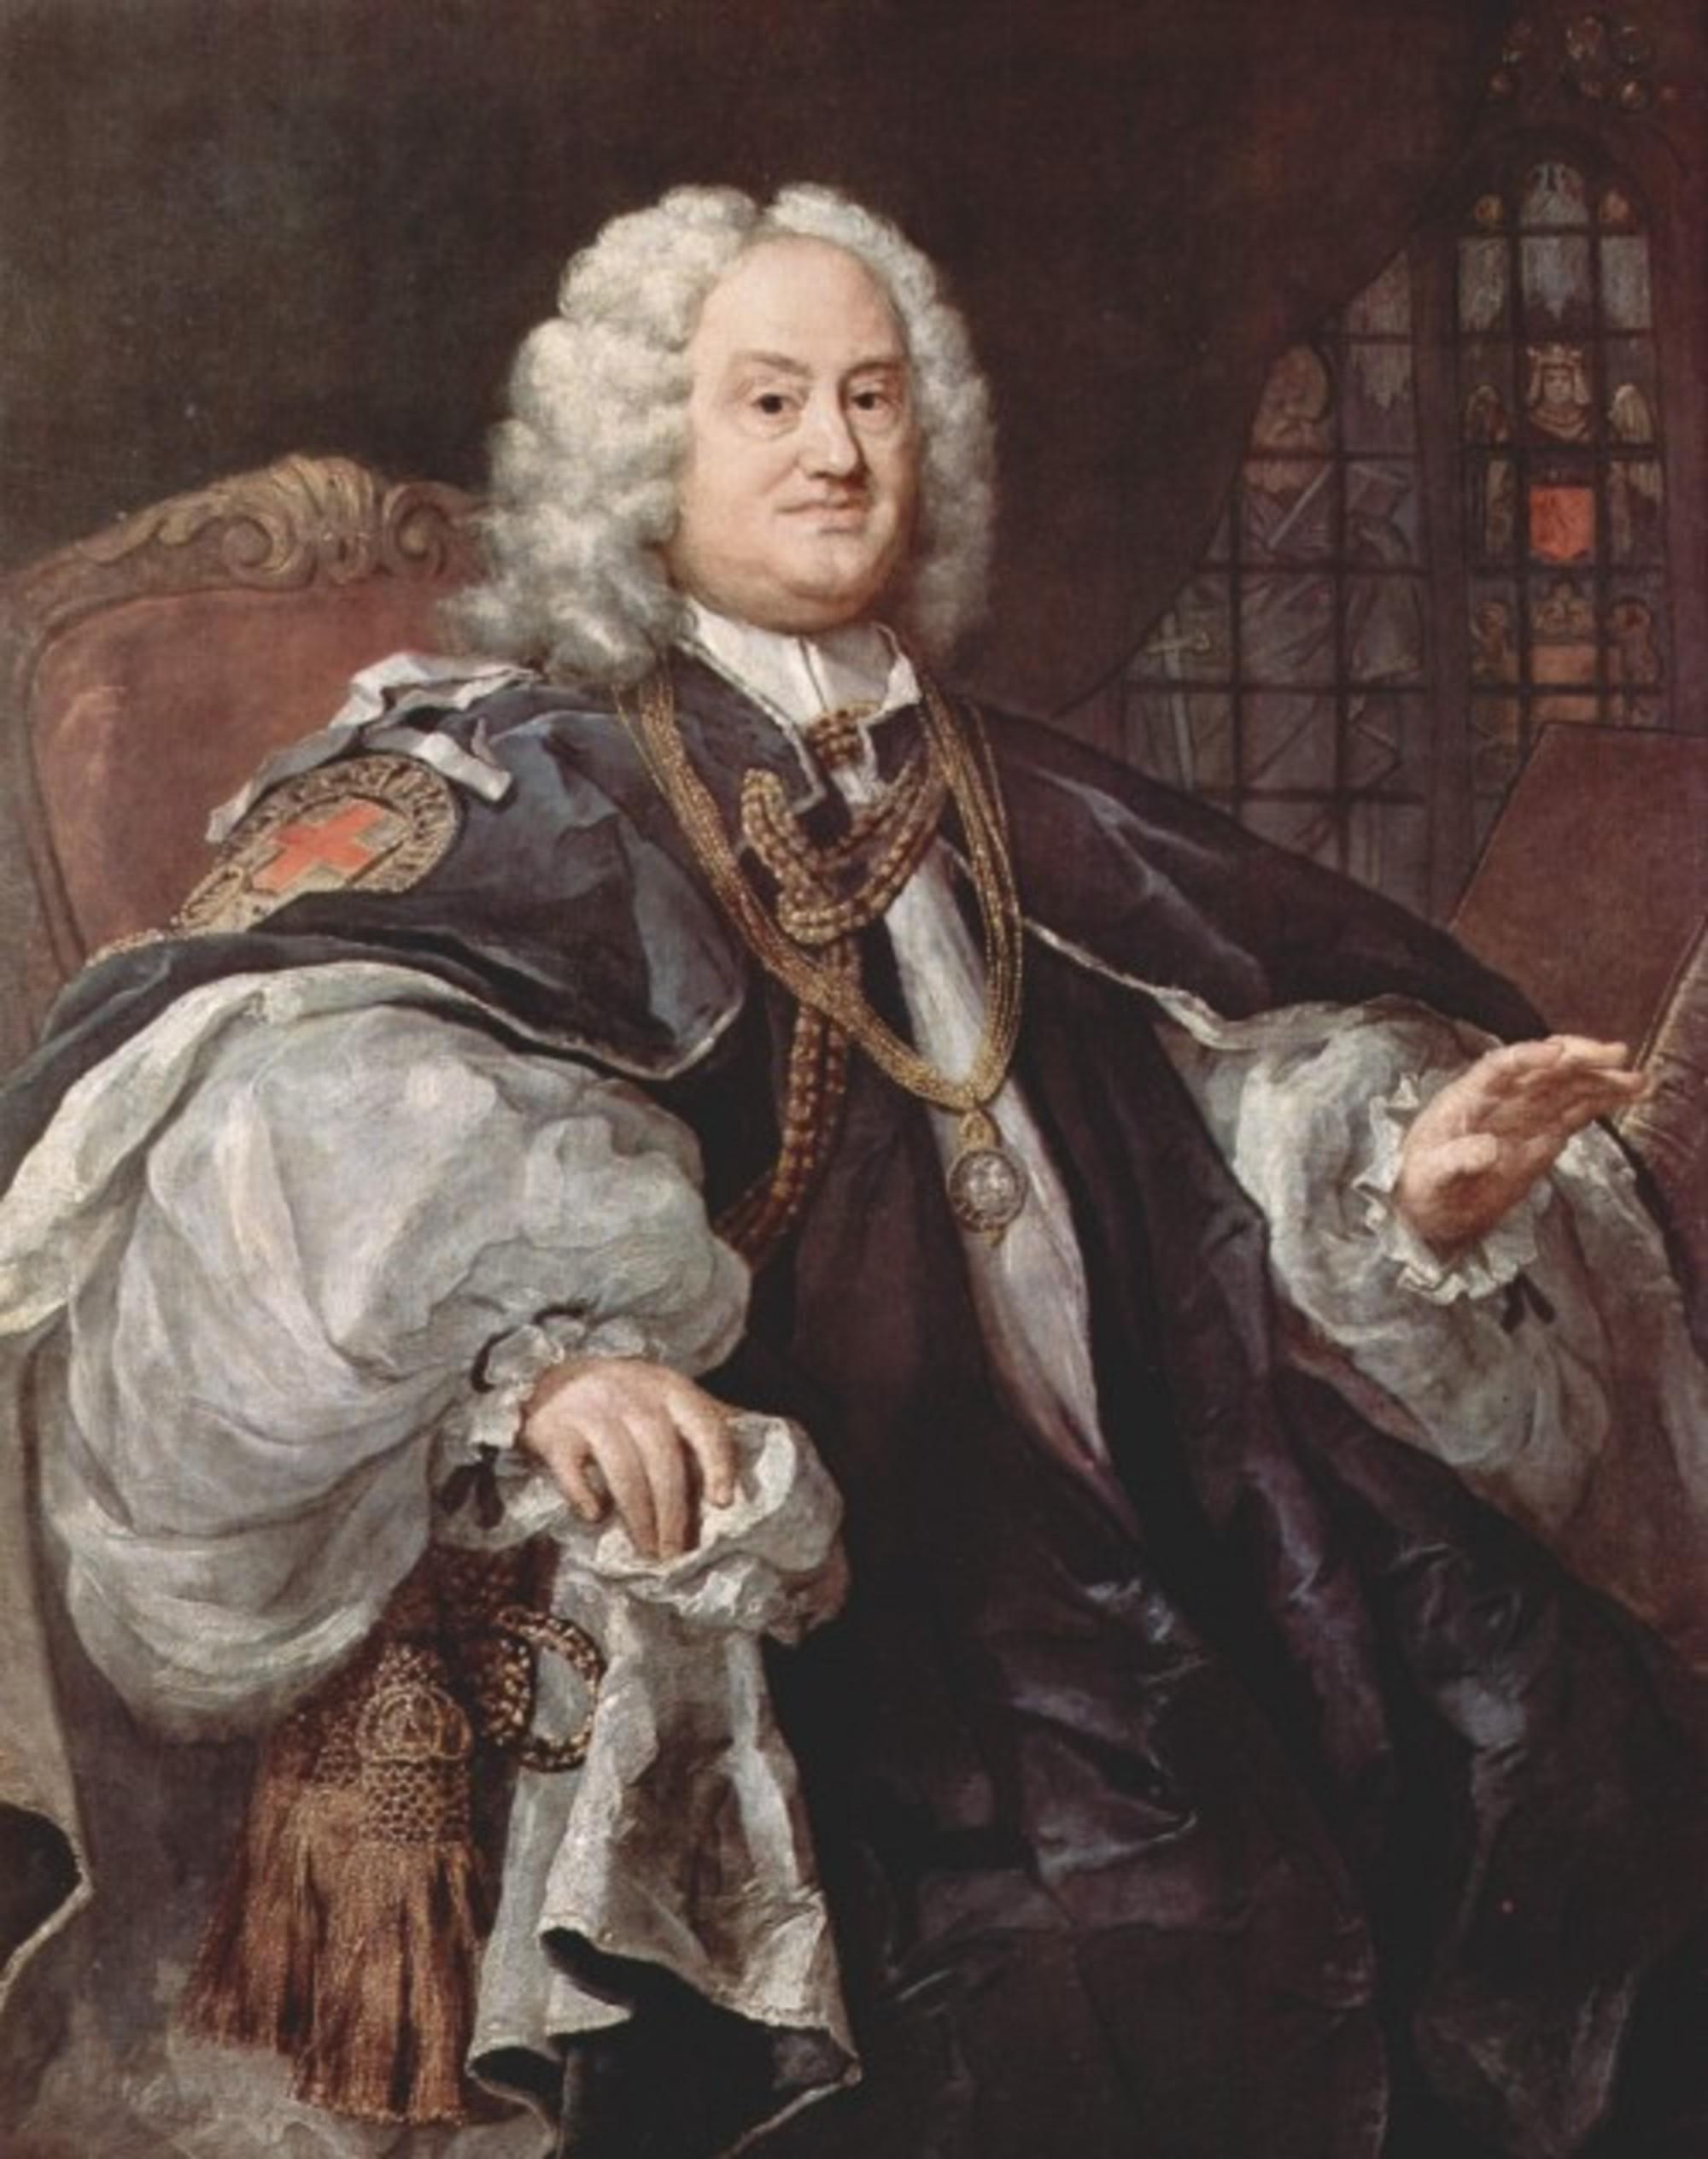 William-Hogarth-052.jpg